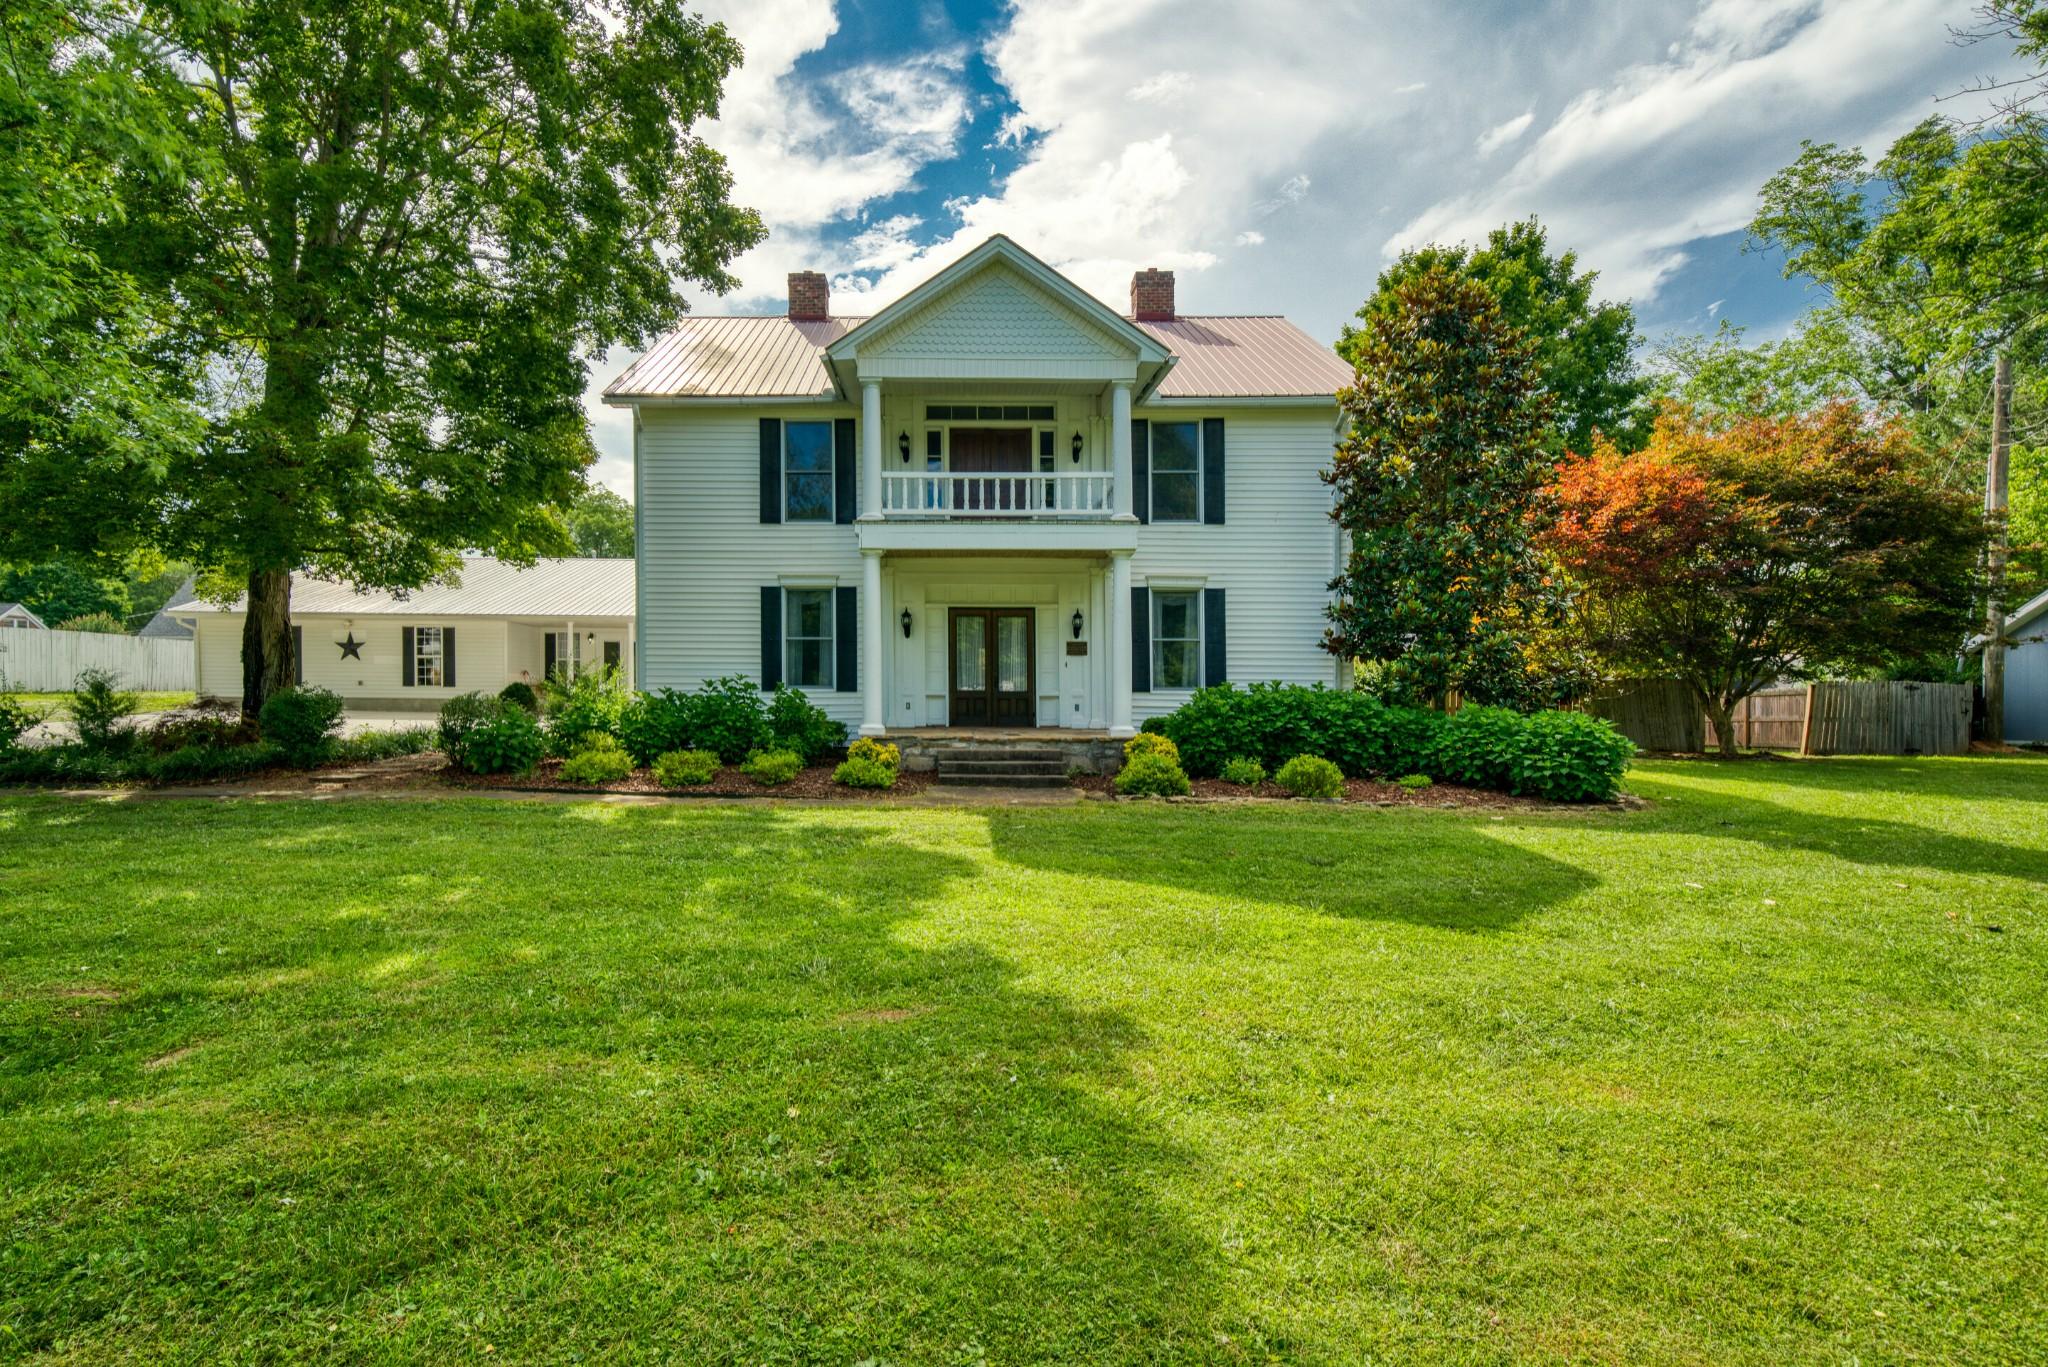 127 N Main St Property Photo - Sparta, TN real estate listing